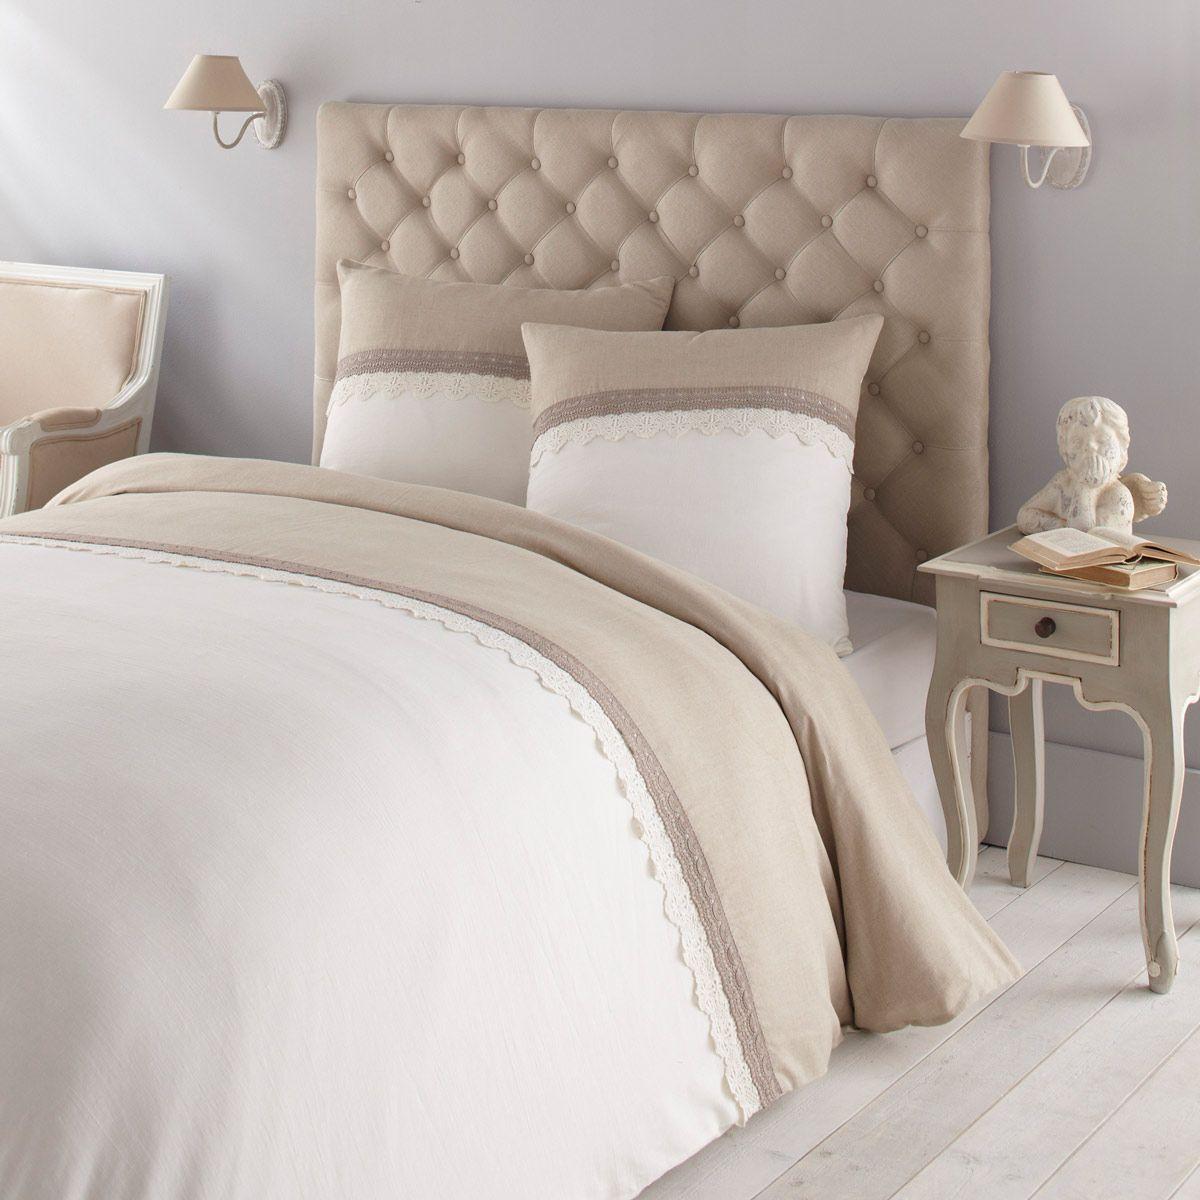 Parure da letto 240 x 260 cm bianca ed ecru in lino MANOSQUE